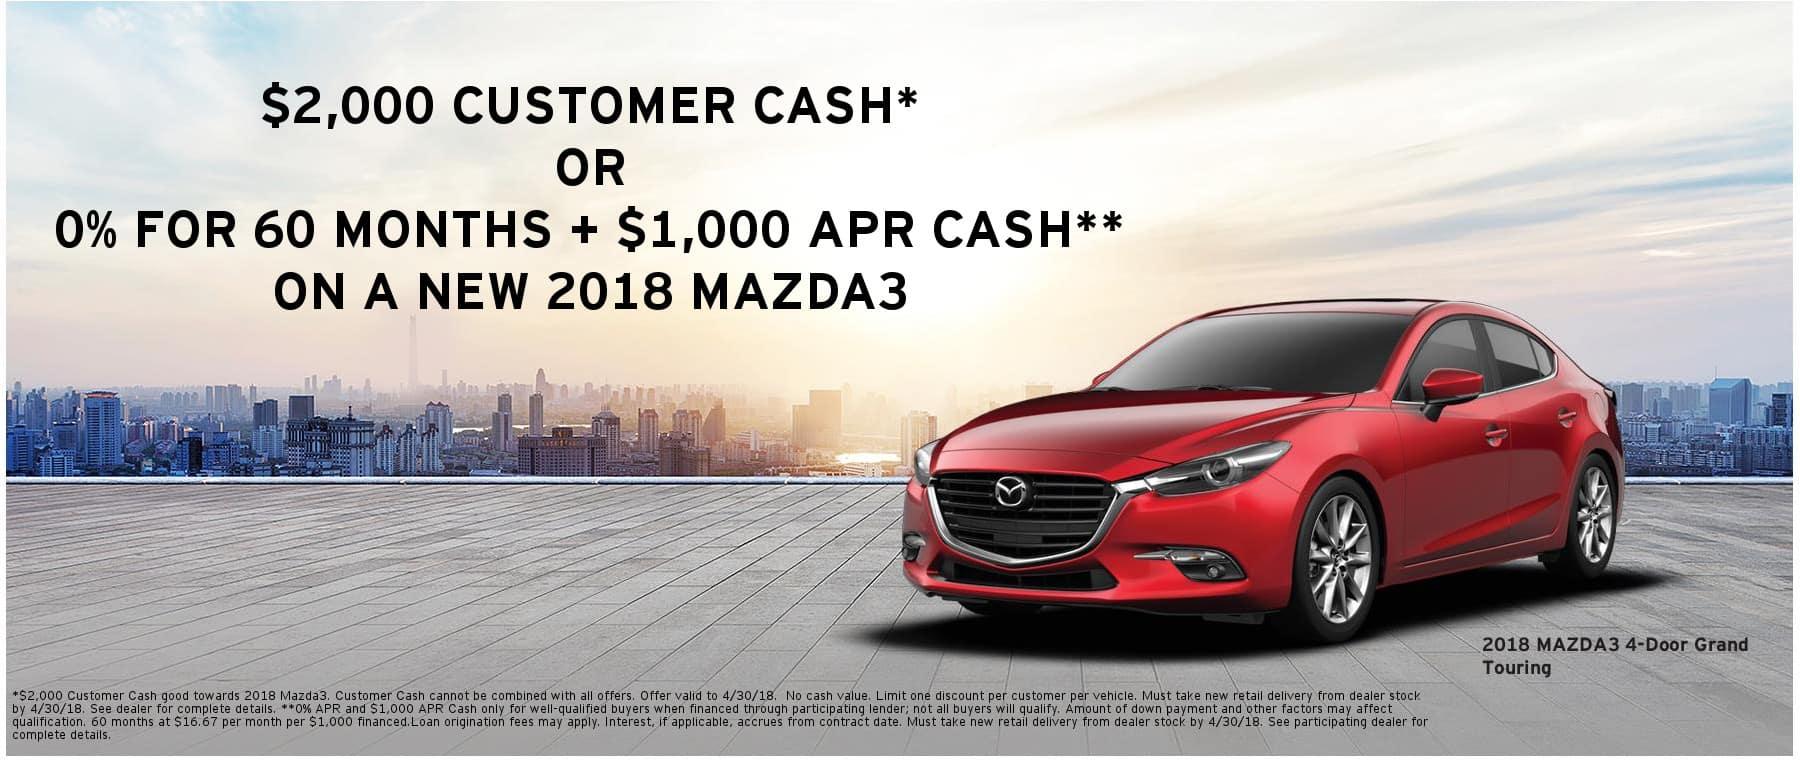 Mazda3 TX CC APR Cash 1800x760